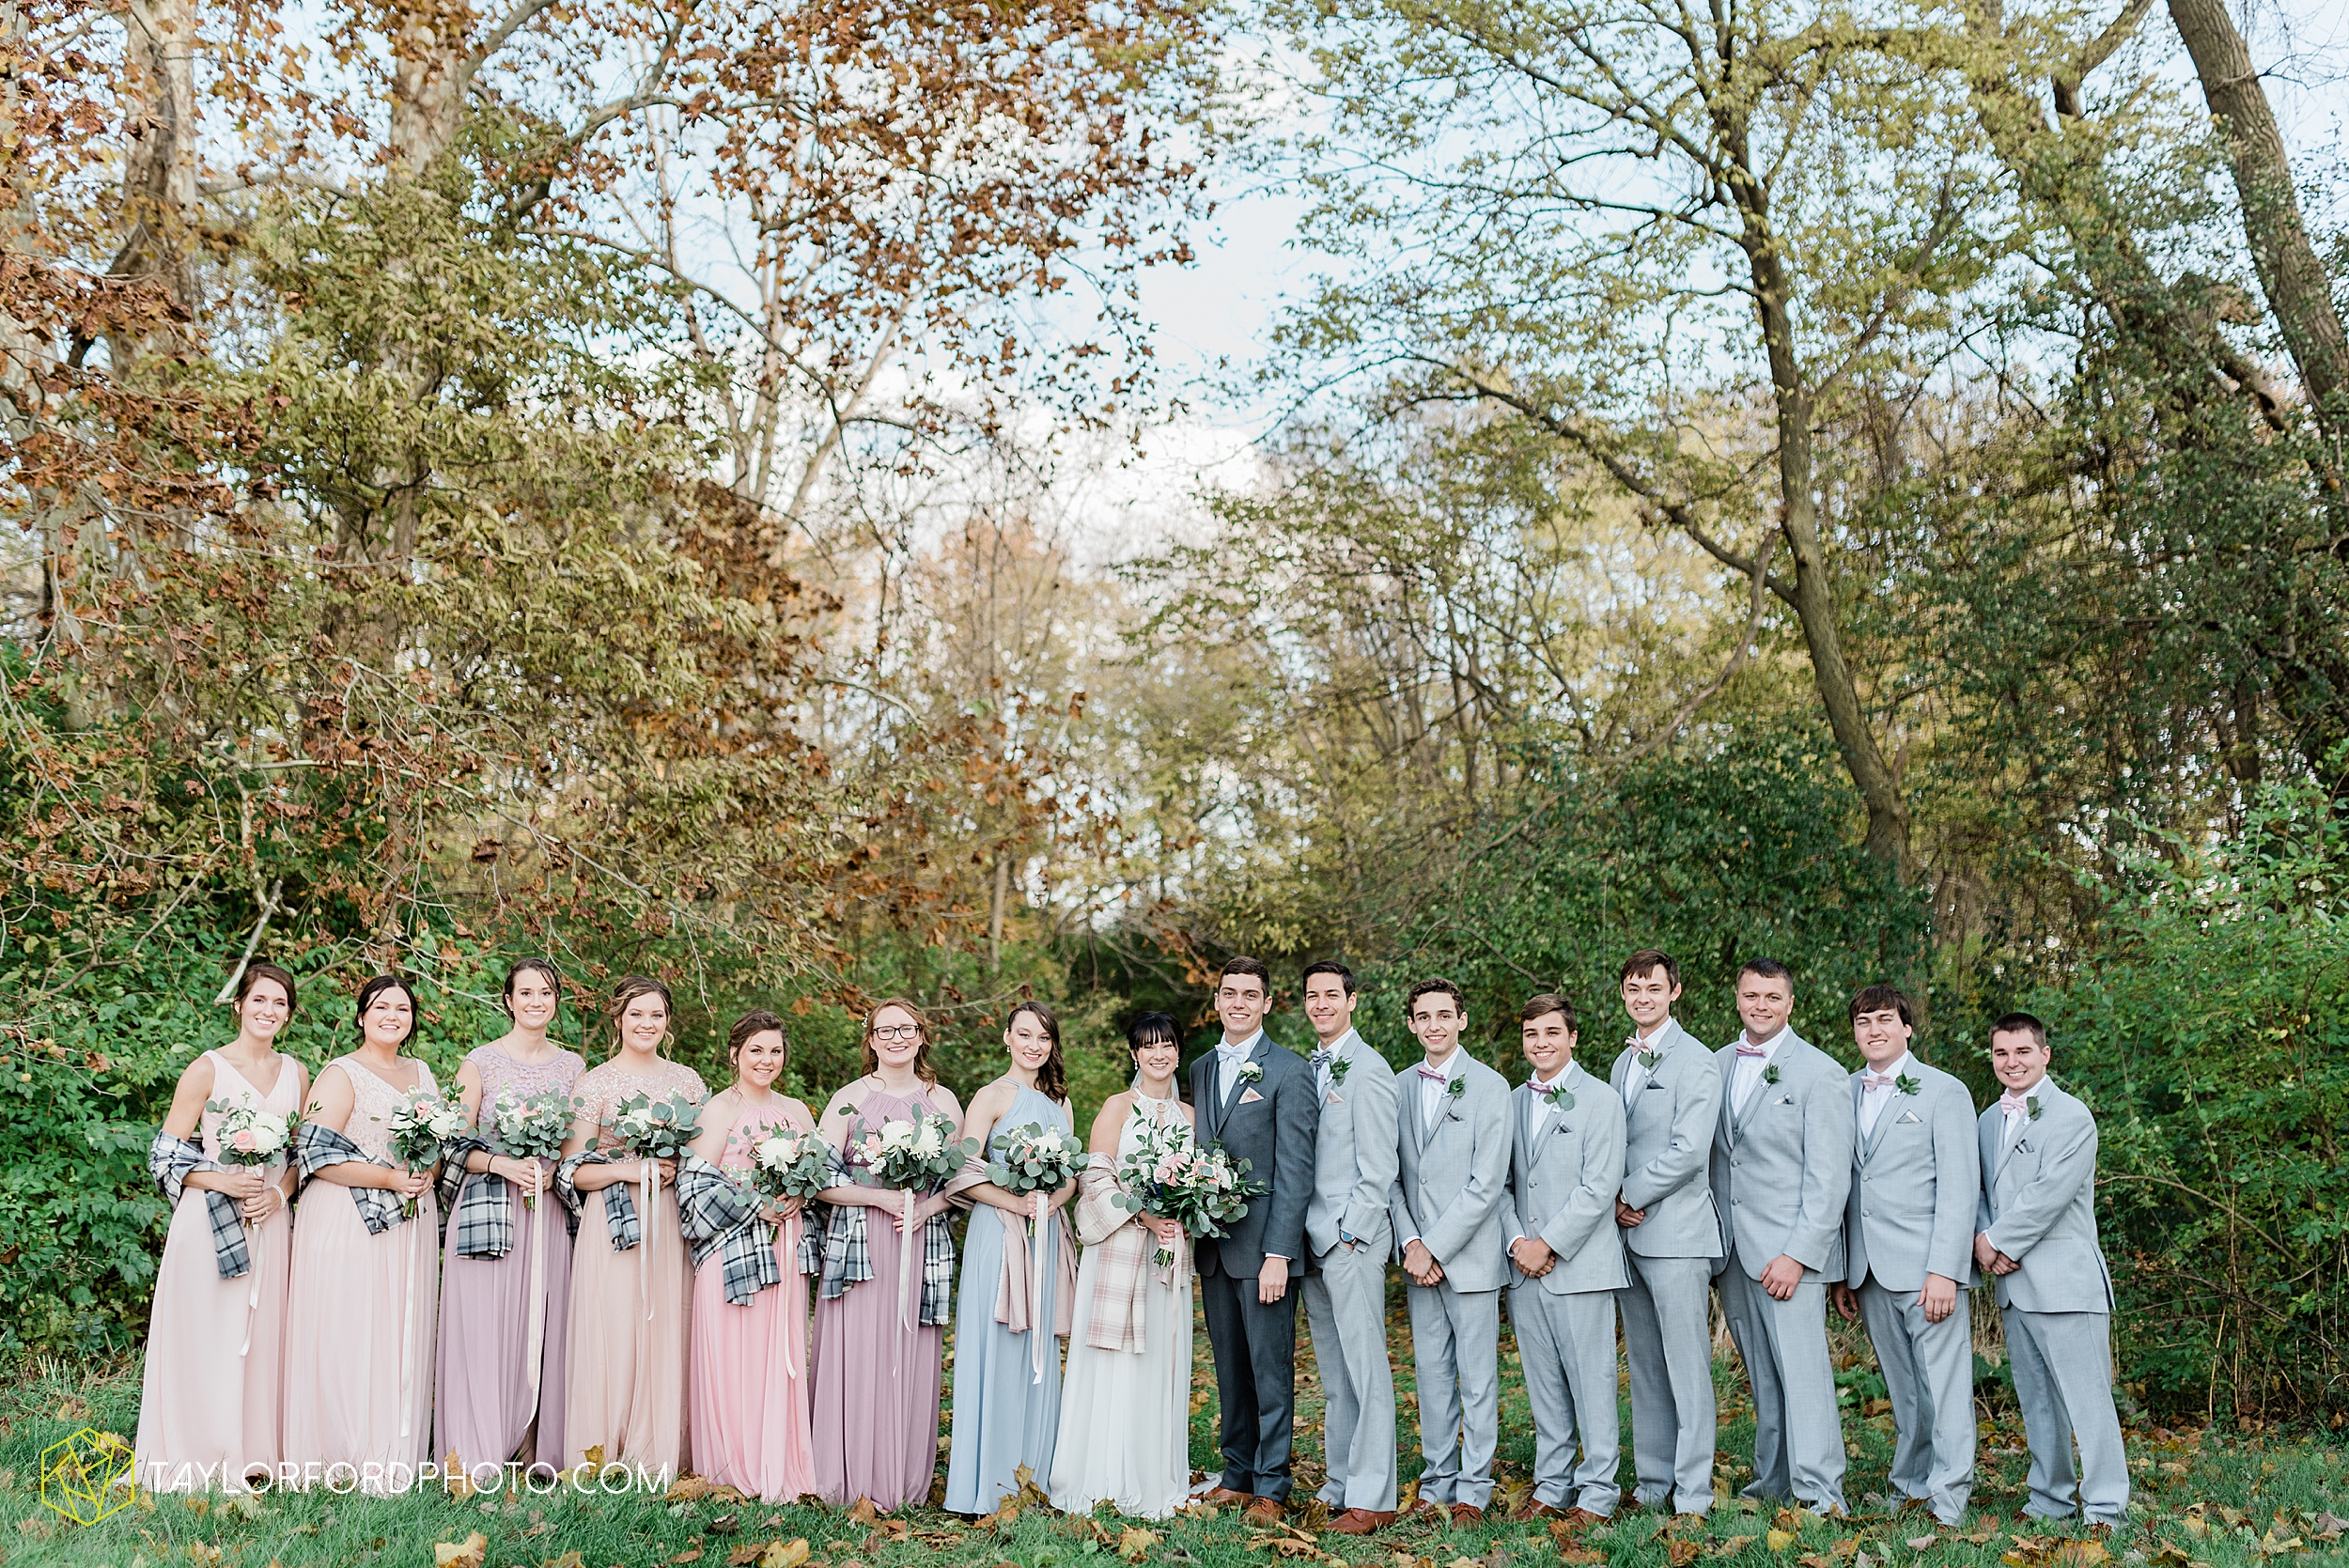 marissa-nicole-nick-daeger-orrmont-estate-farm-wedding-piqua-dayton-troy-ohio-fall-photographer-taylor-ford-photography_1531.jpg